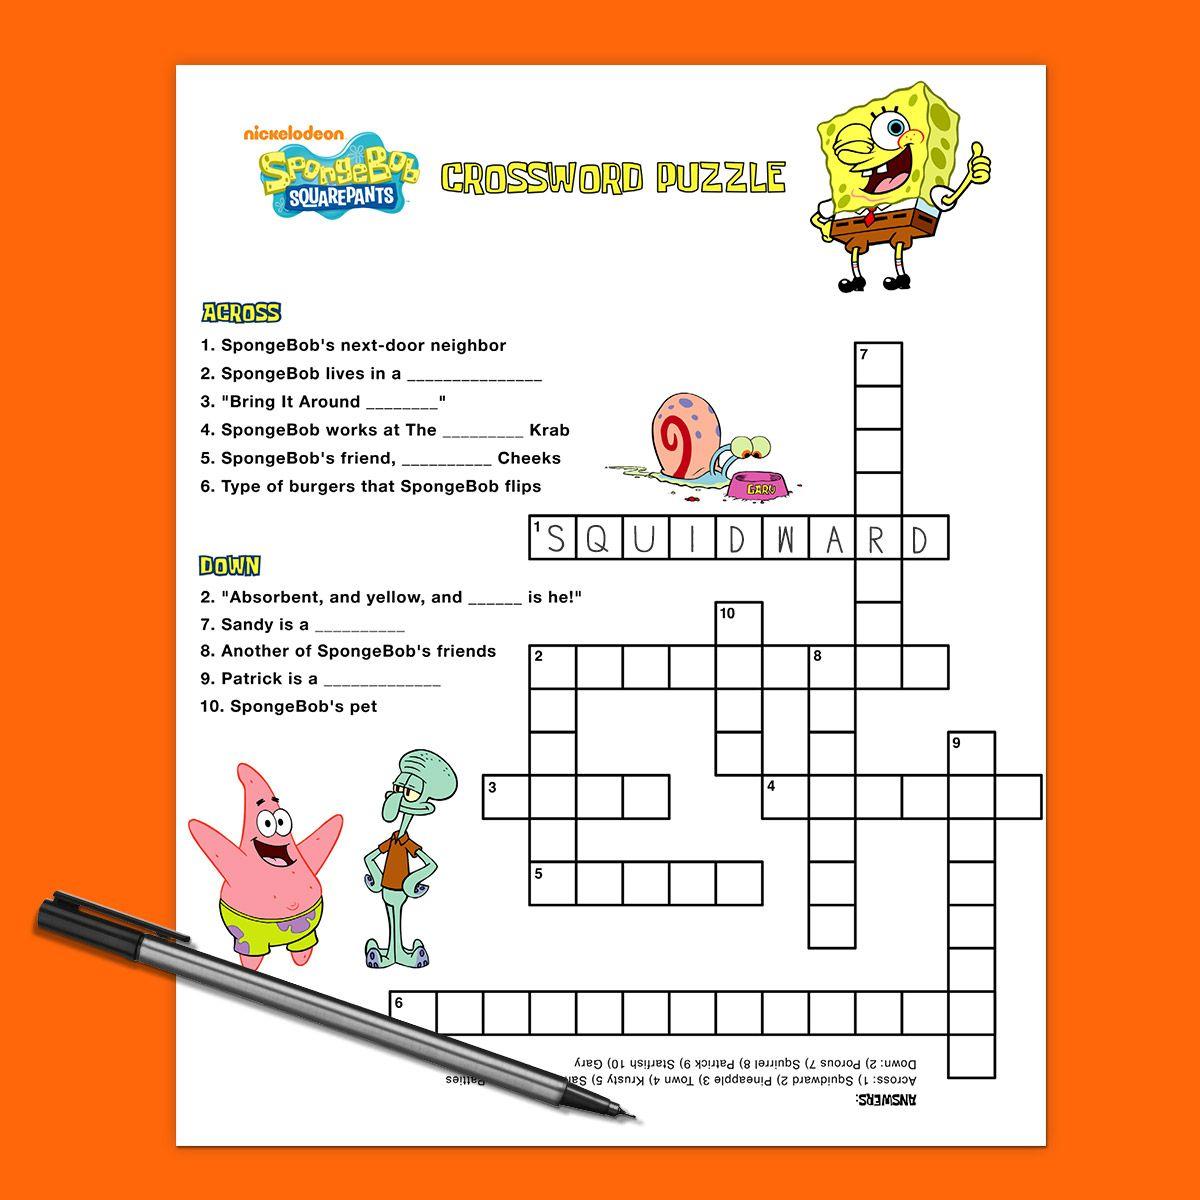 Spongebob Crossword Puzzle With Images